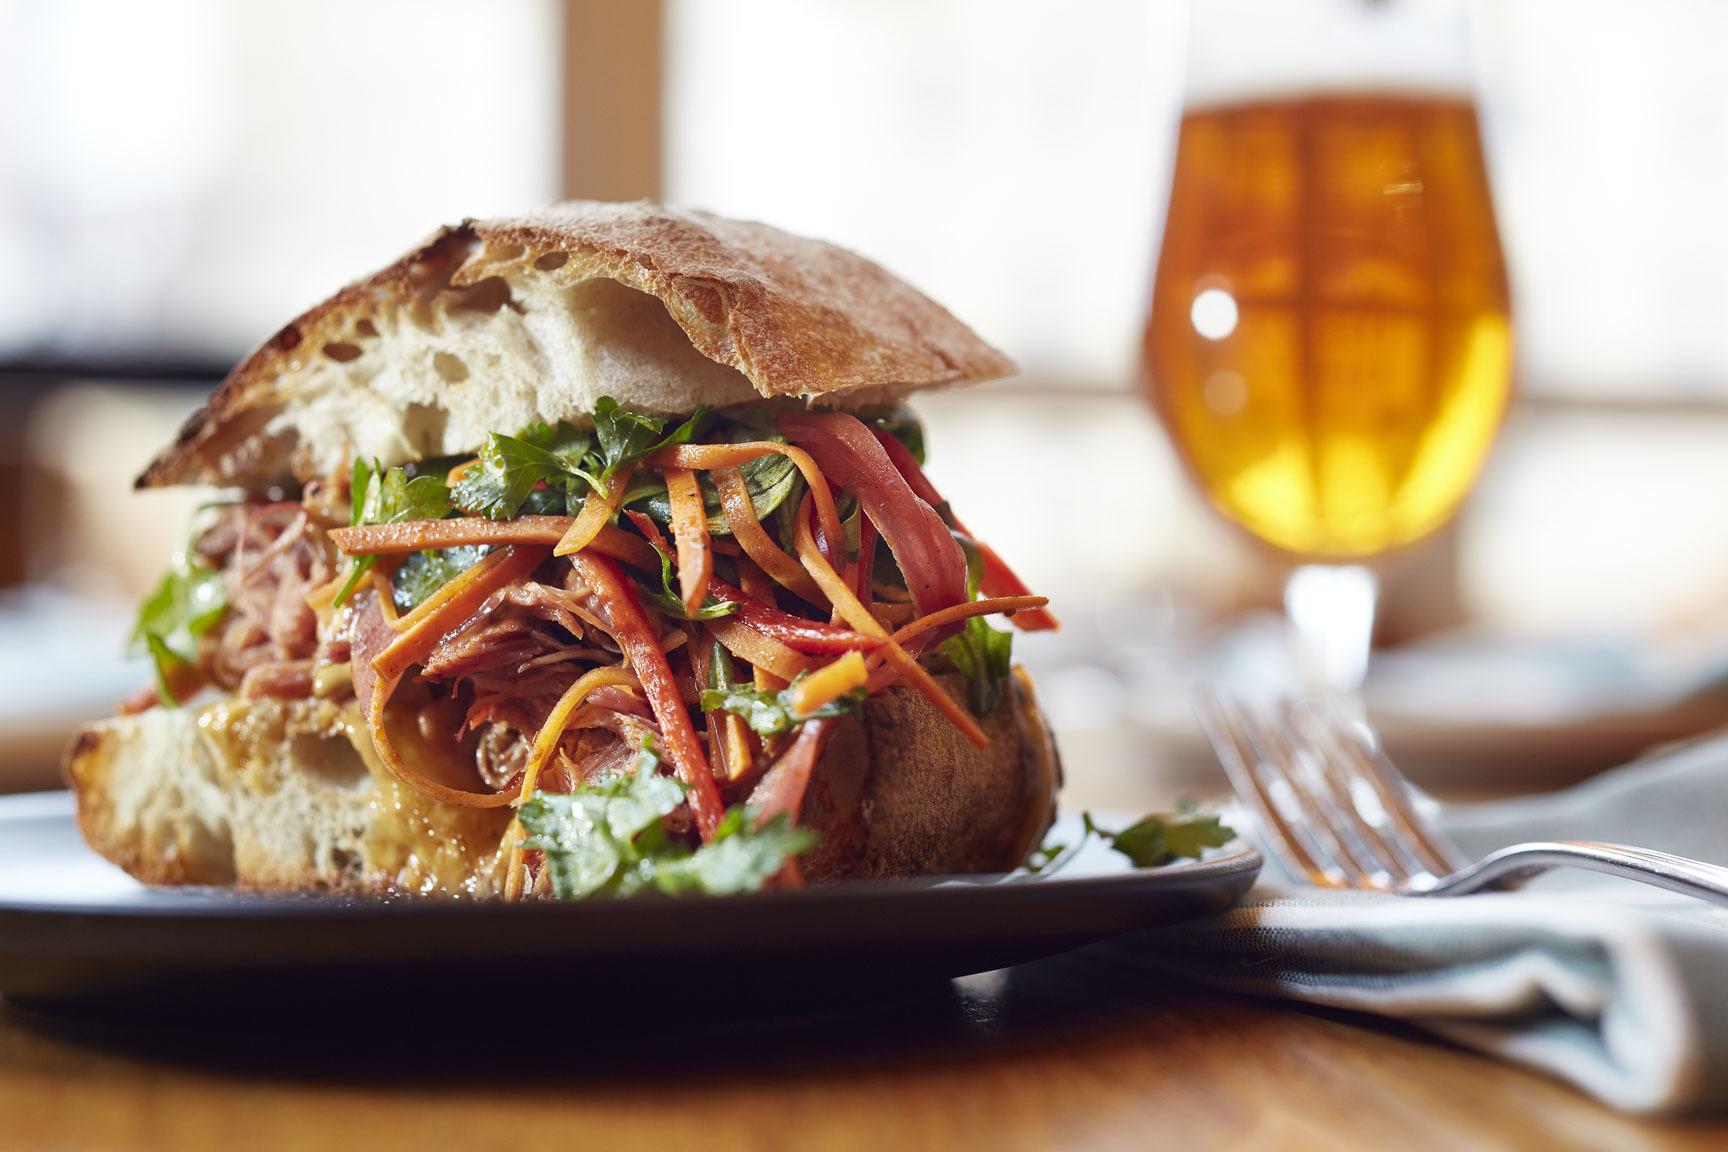 Slow-roasted pork sandwich at Avec